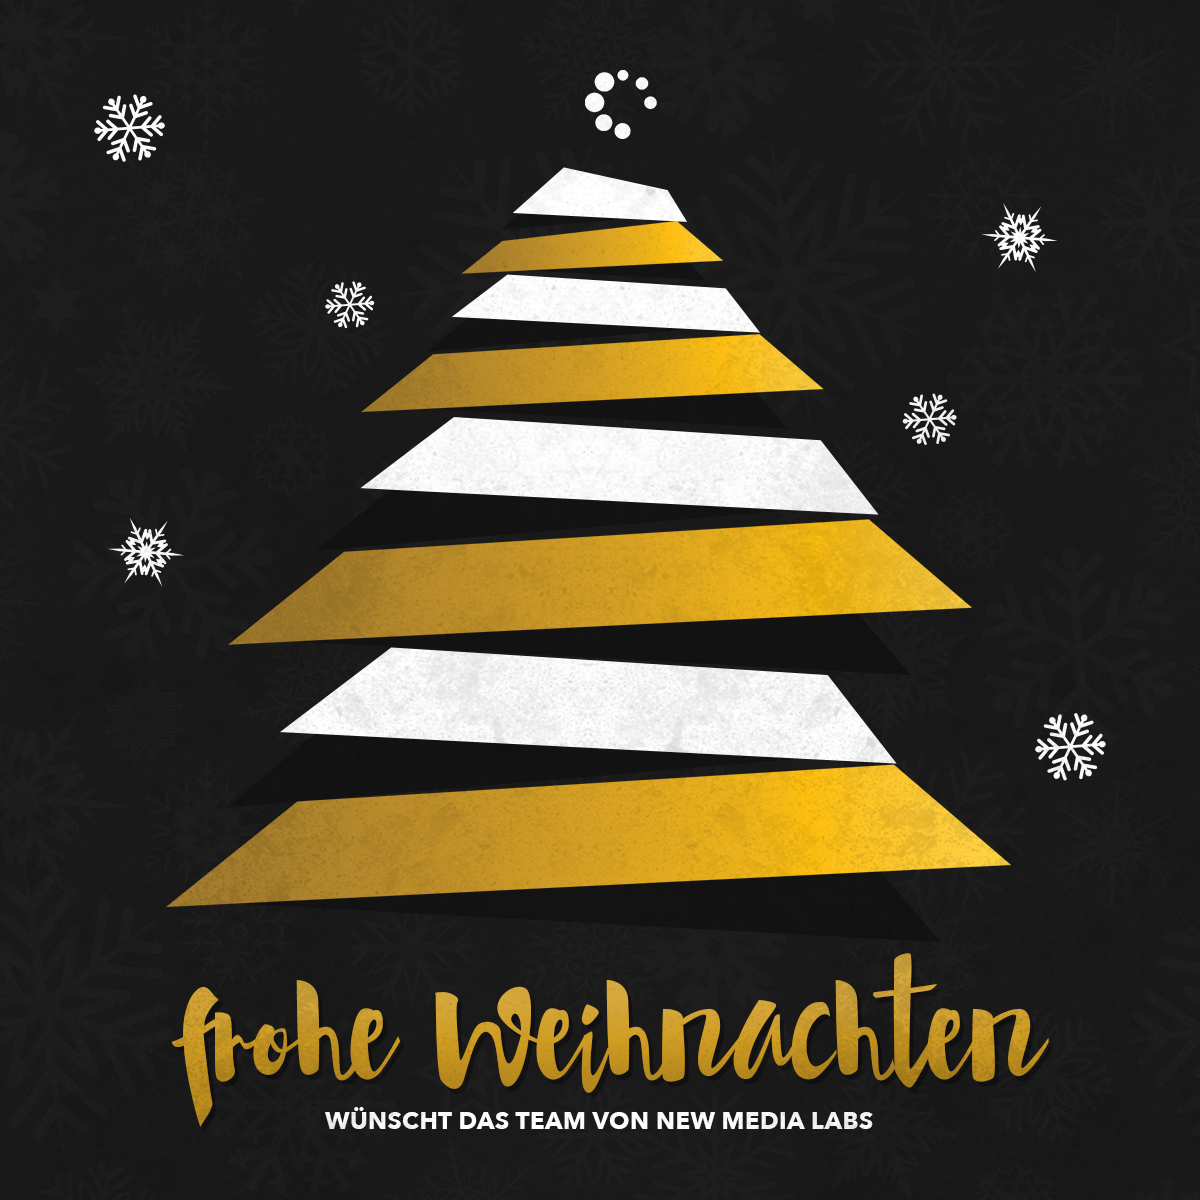 new media labs wünscht frohe Weihnachten